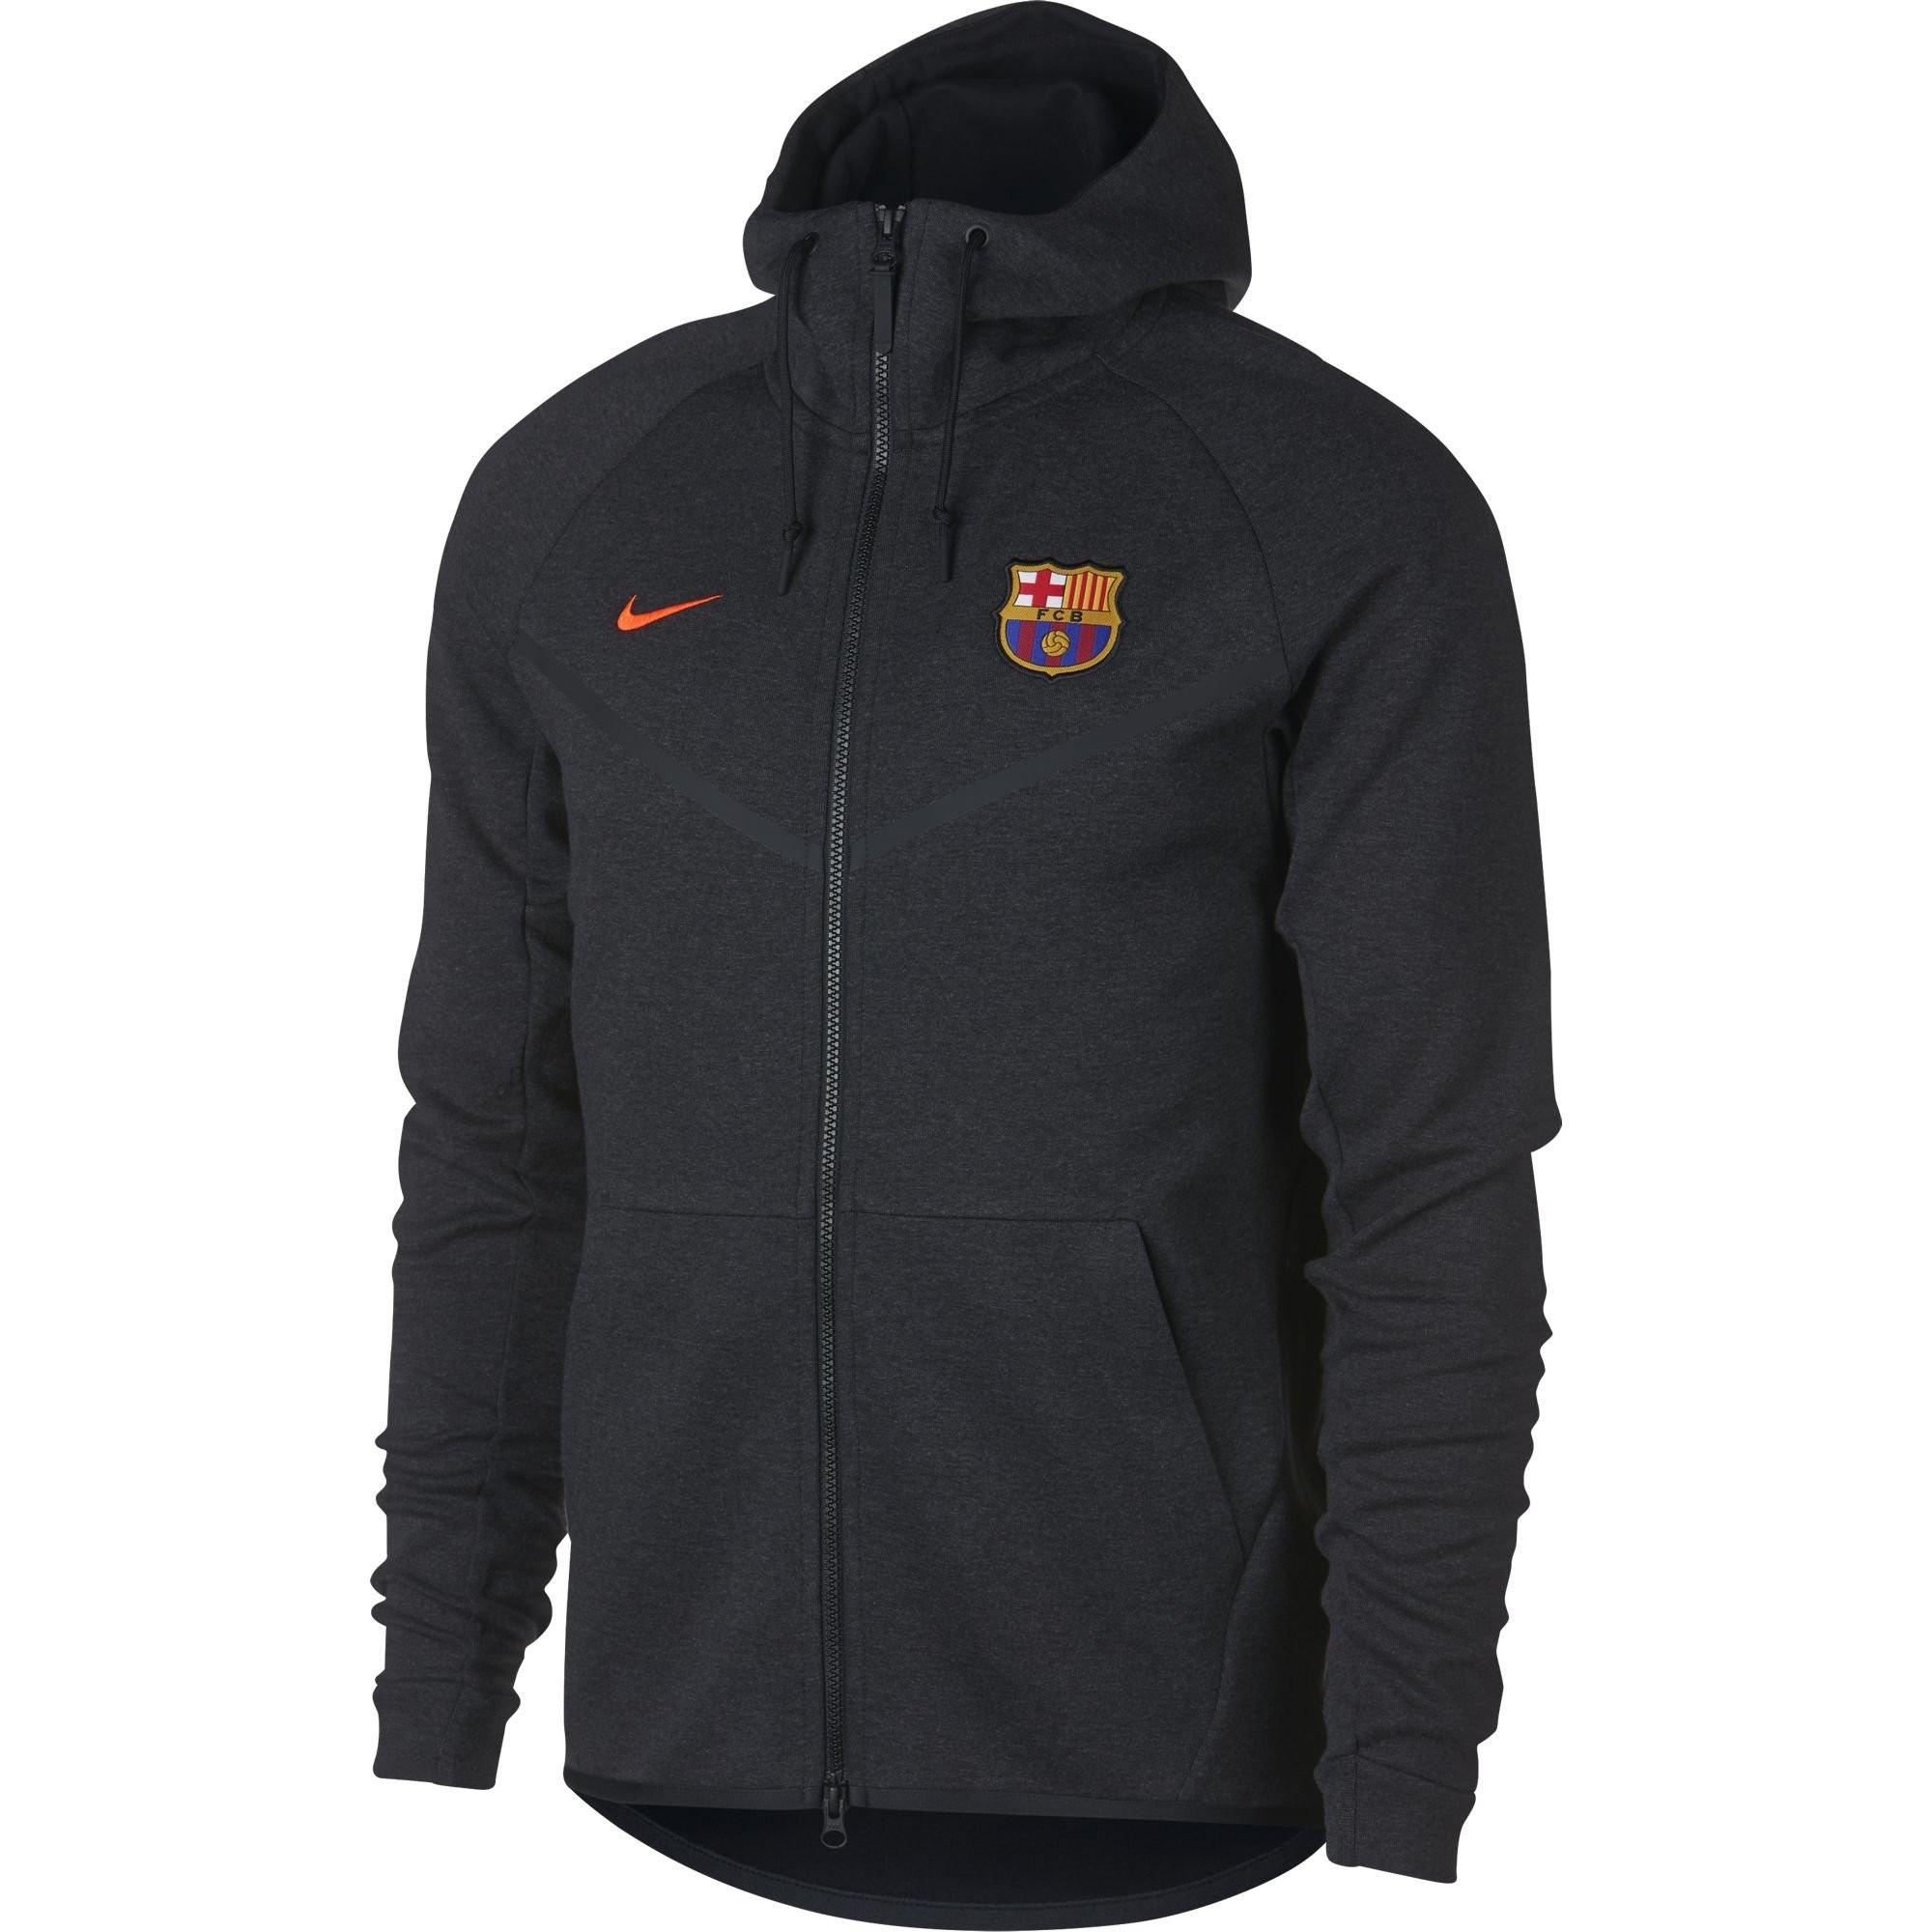 Barcelone Nike Fleece 20172018 Noir Veste Jkt Rayon Tech aUdqwUf